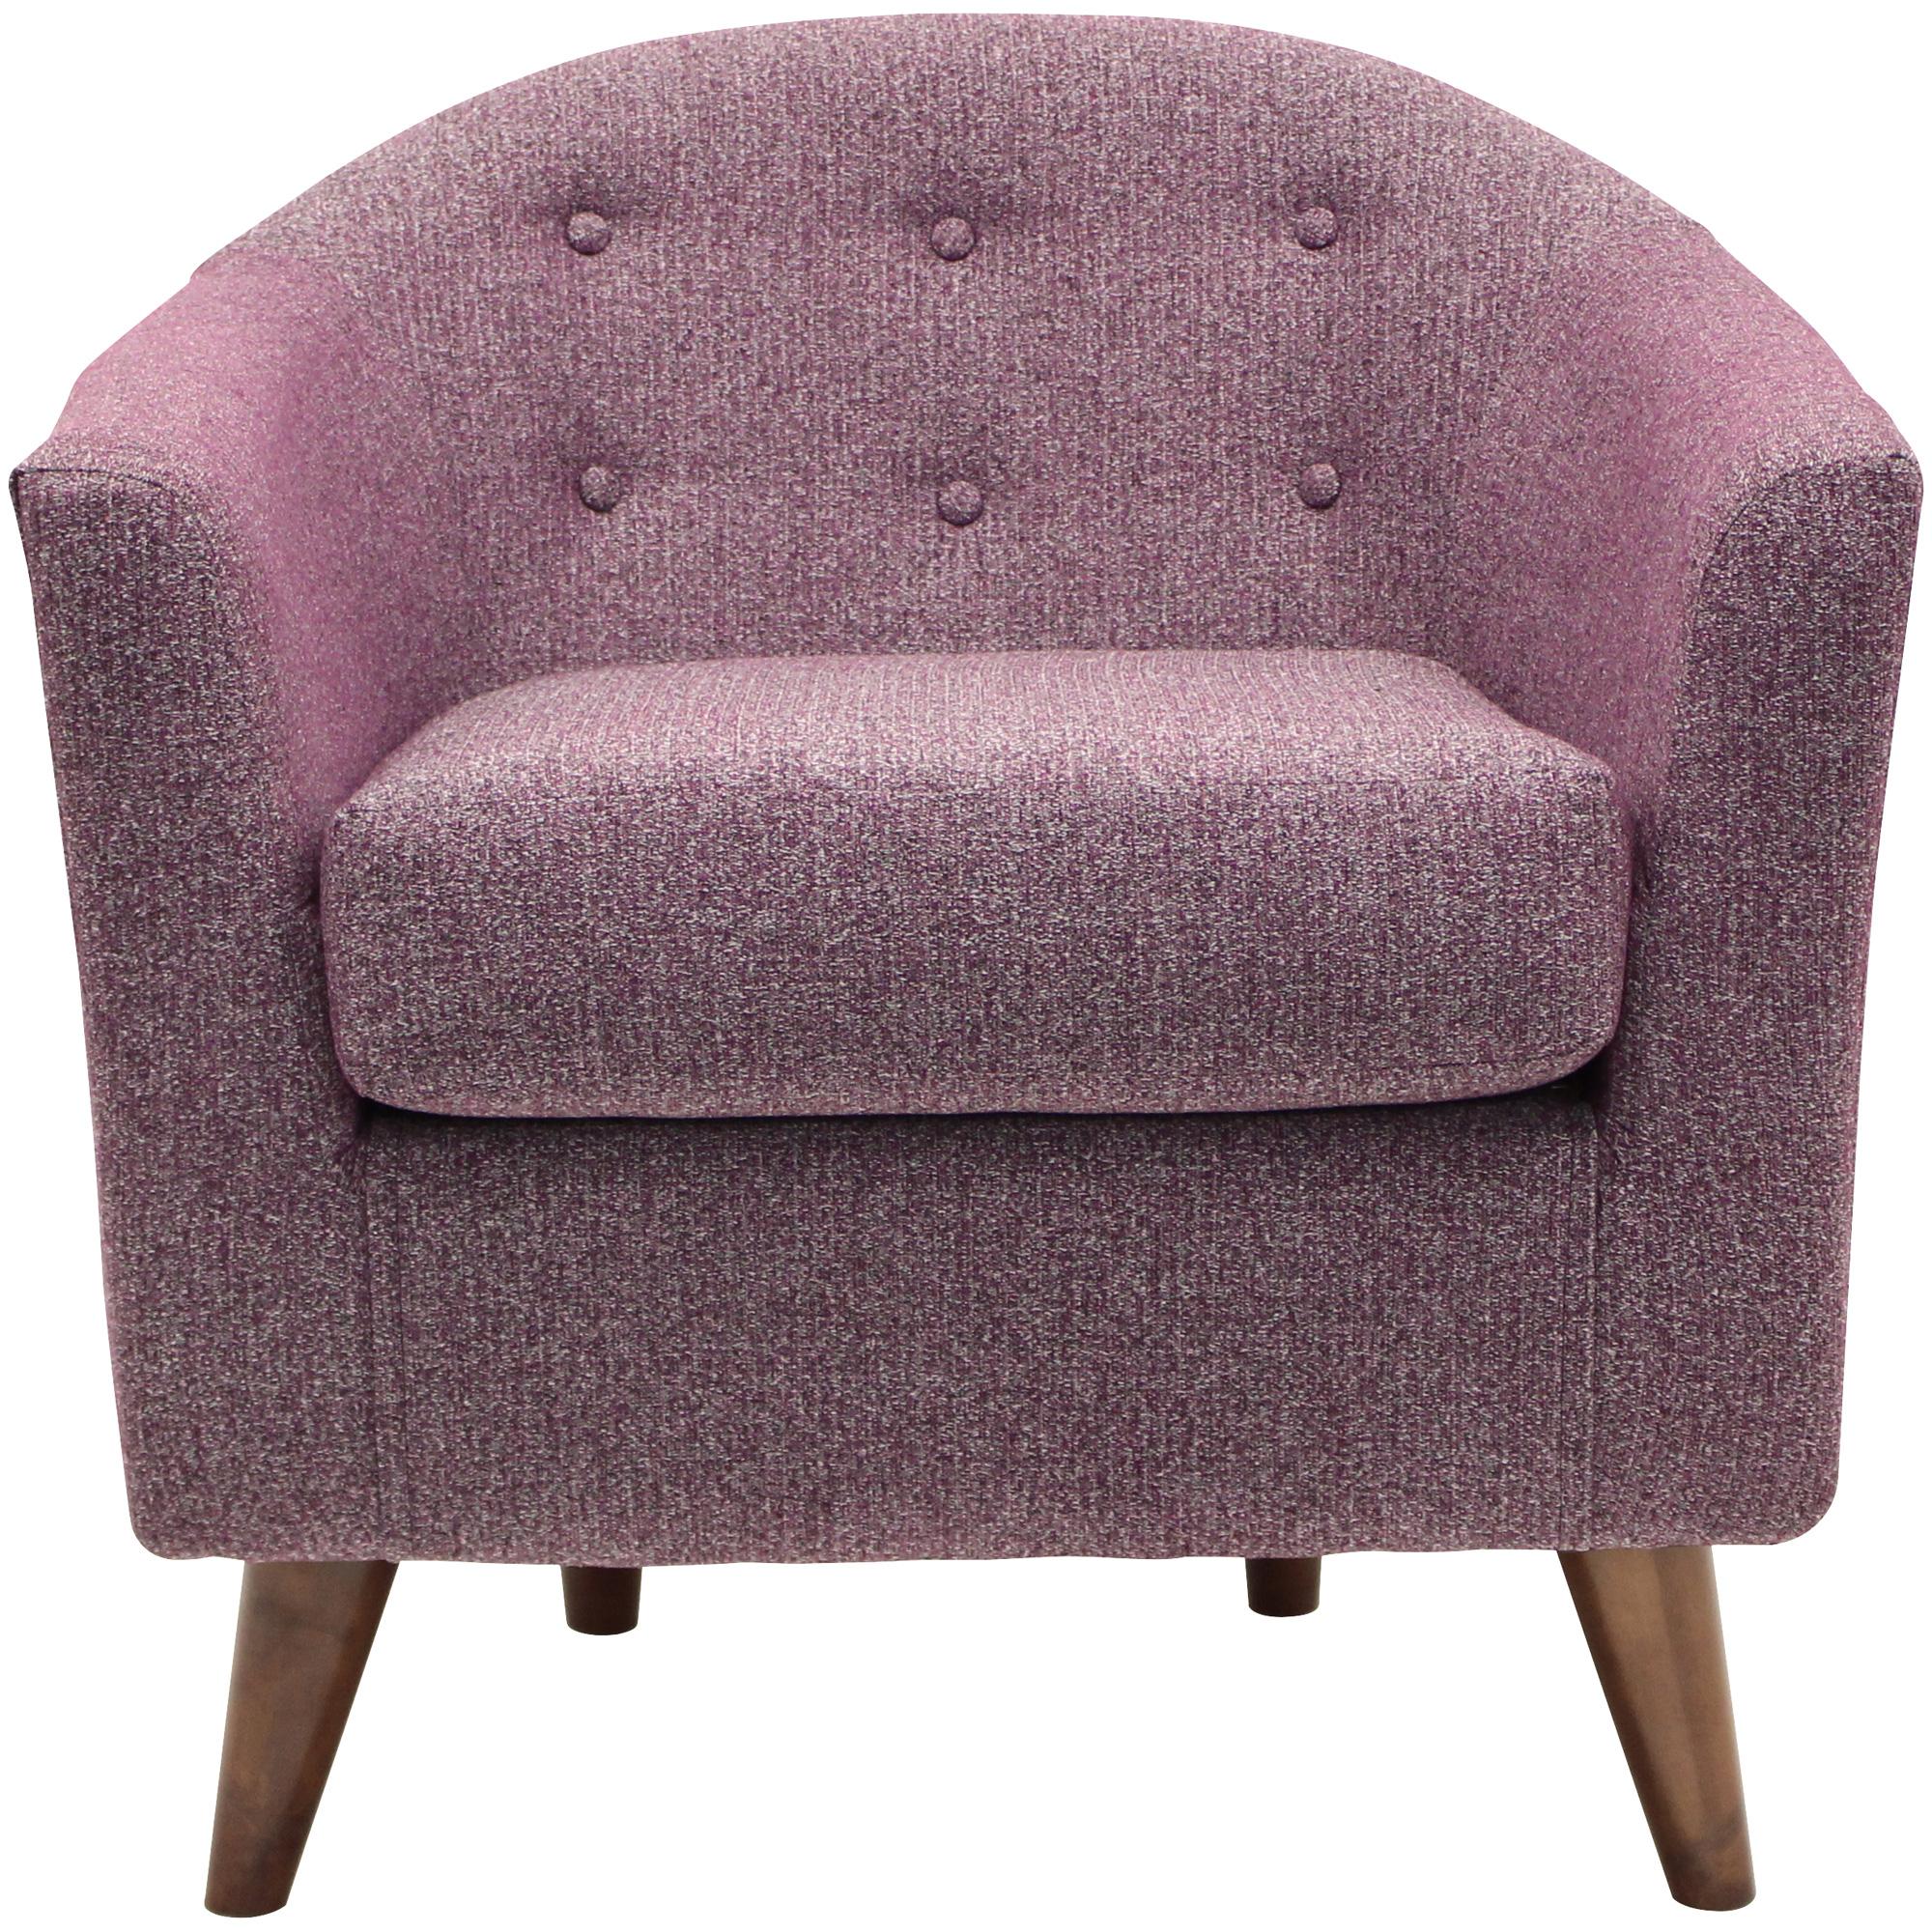 Overman | Marissa Plum Accent Chair